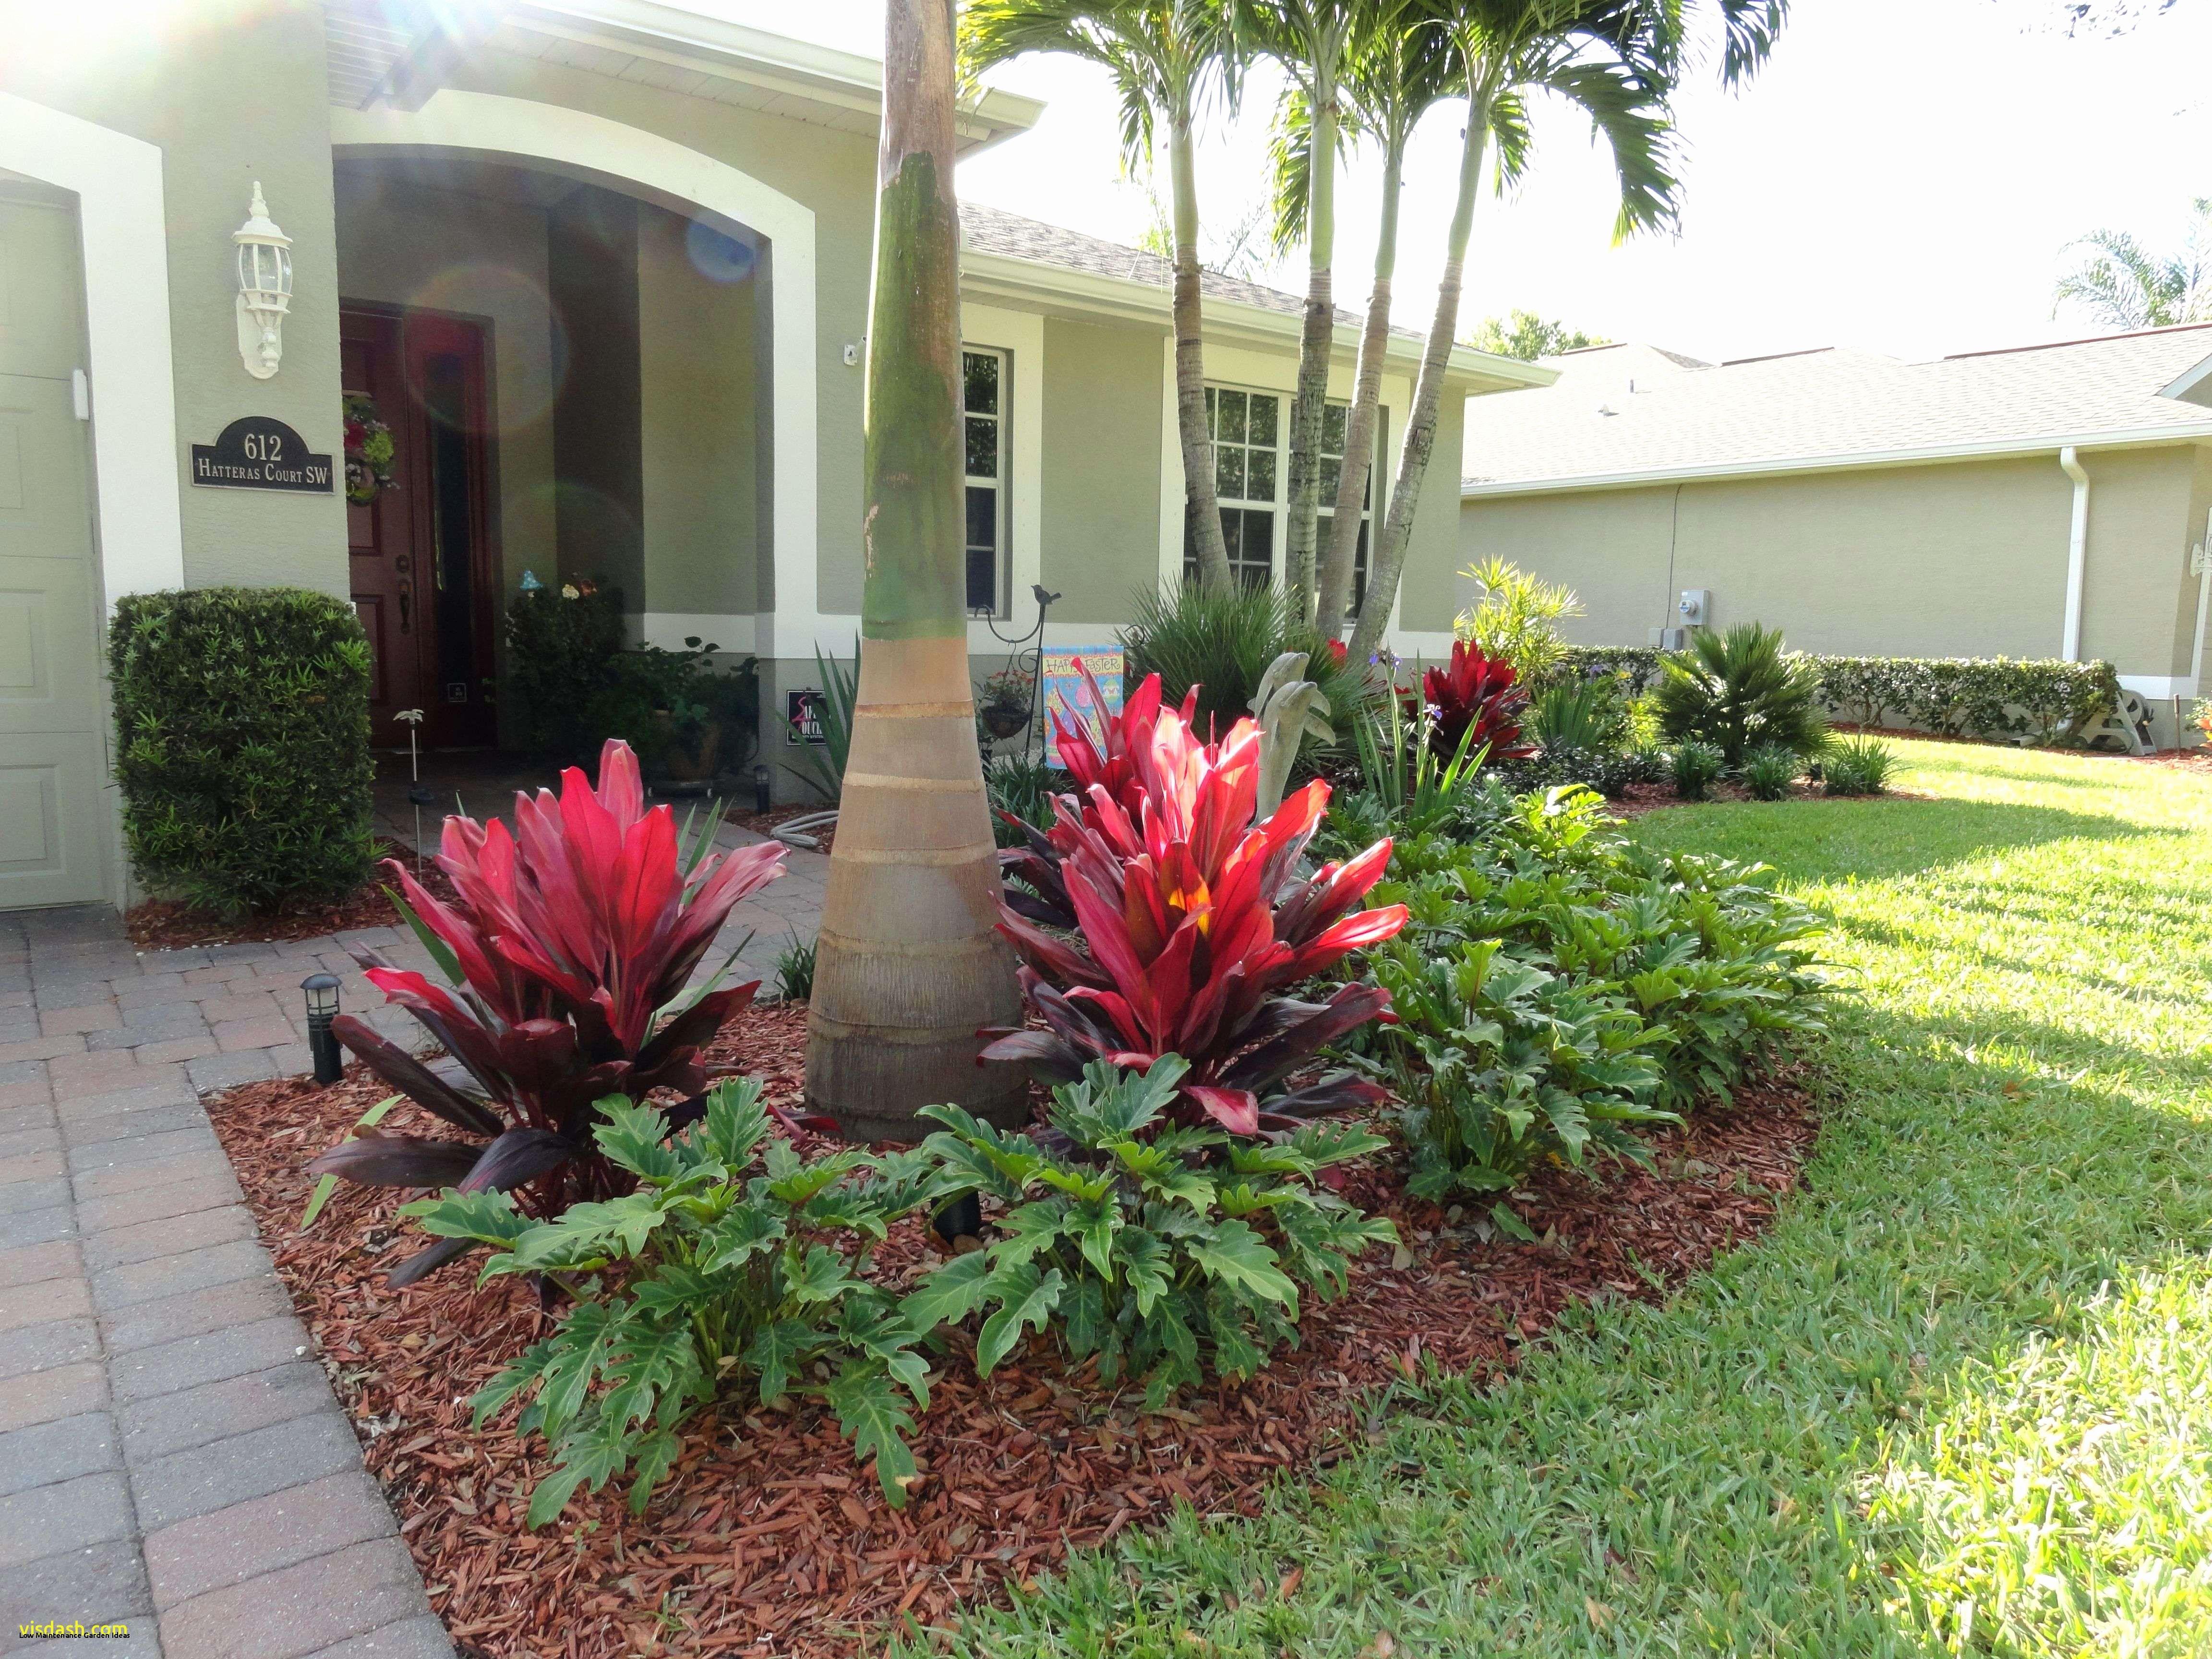 Adorable 75 Incredible Outdoor Patio Design Ideas For Backyard Lovelyving Com Amenagement Jardin Avec Palmier Jardin Tropical Decoration Jardin